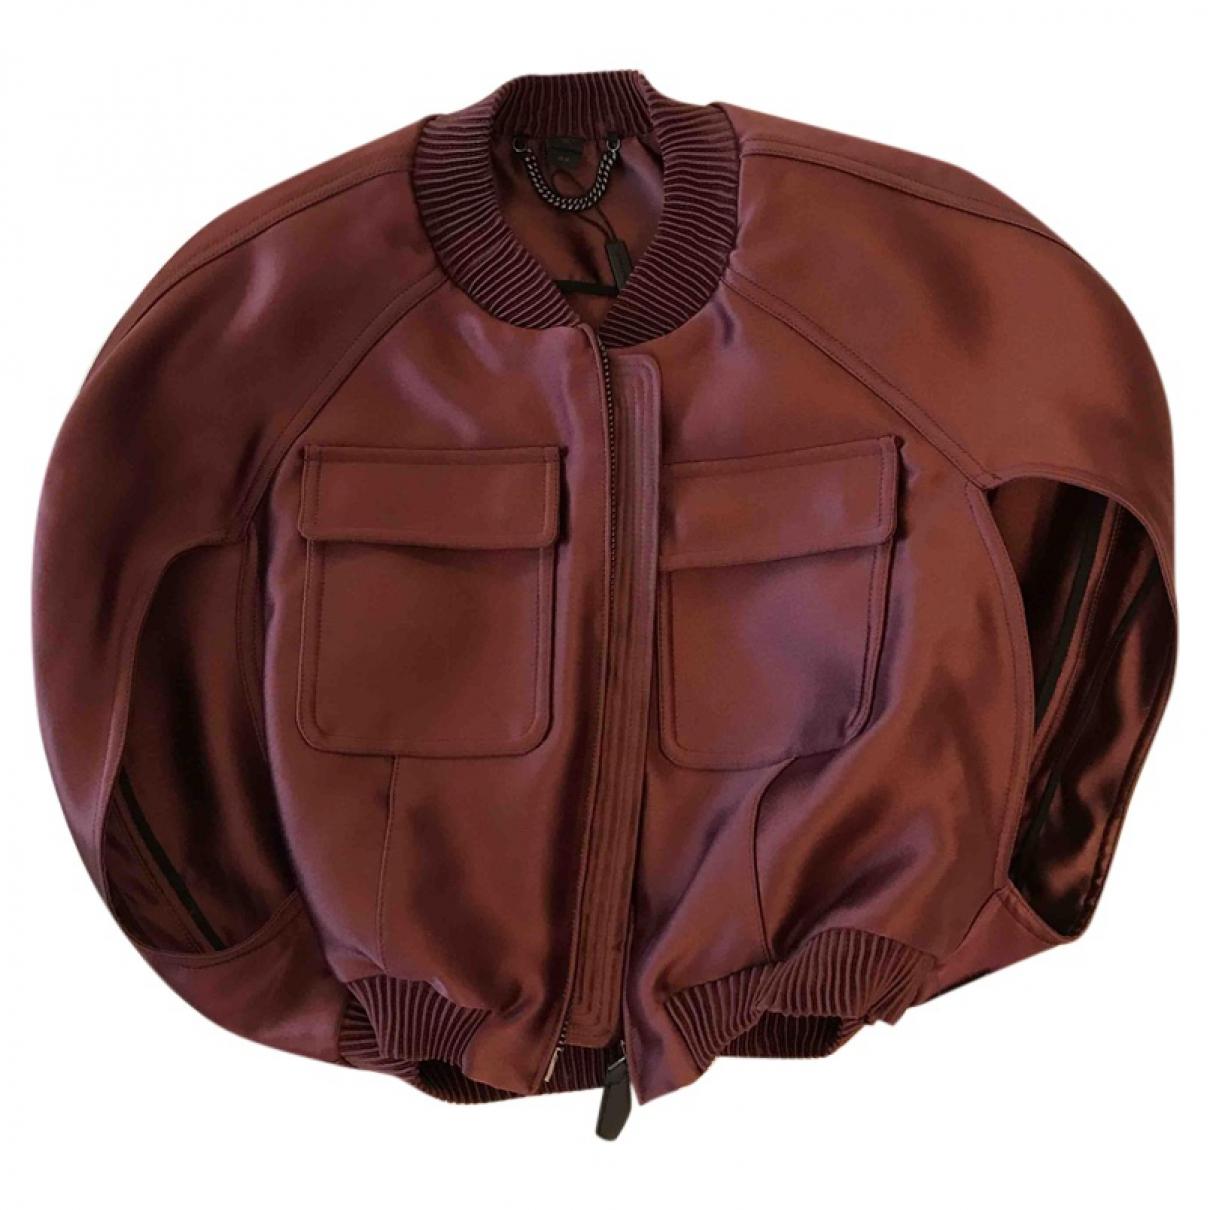 Burberry \N Burgundy jacket for Women 44 IT